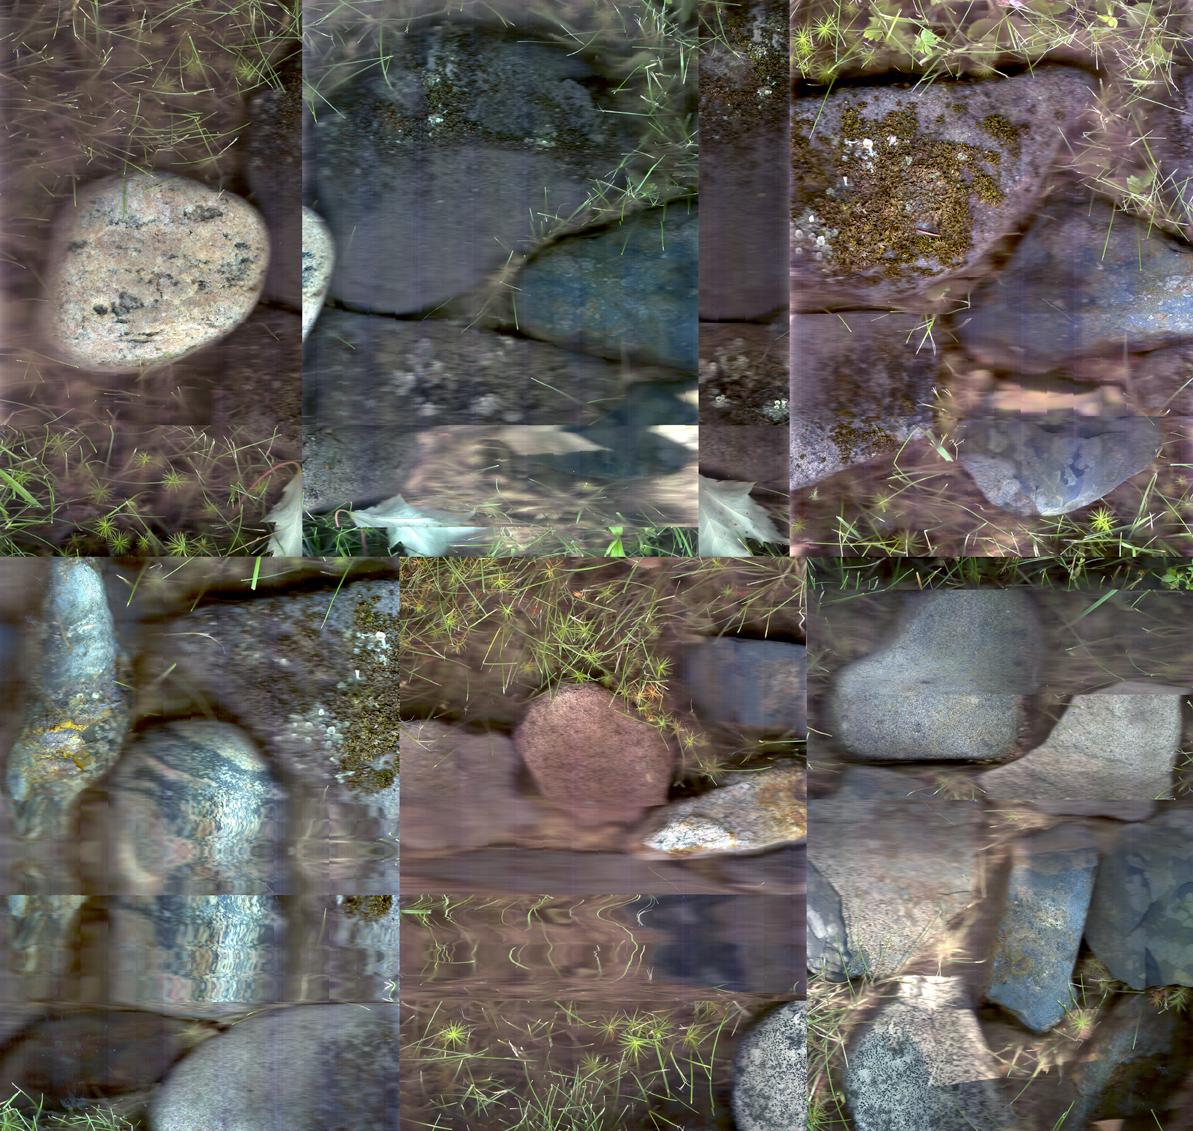 lakerocks